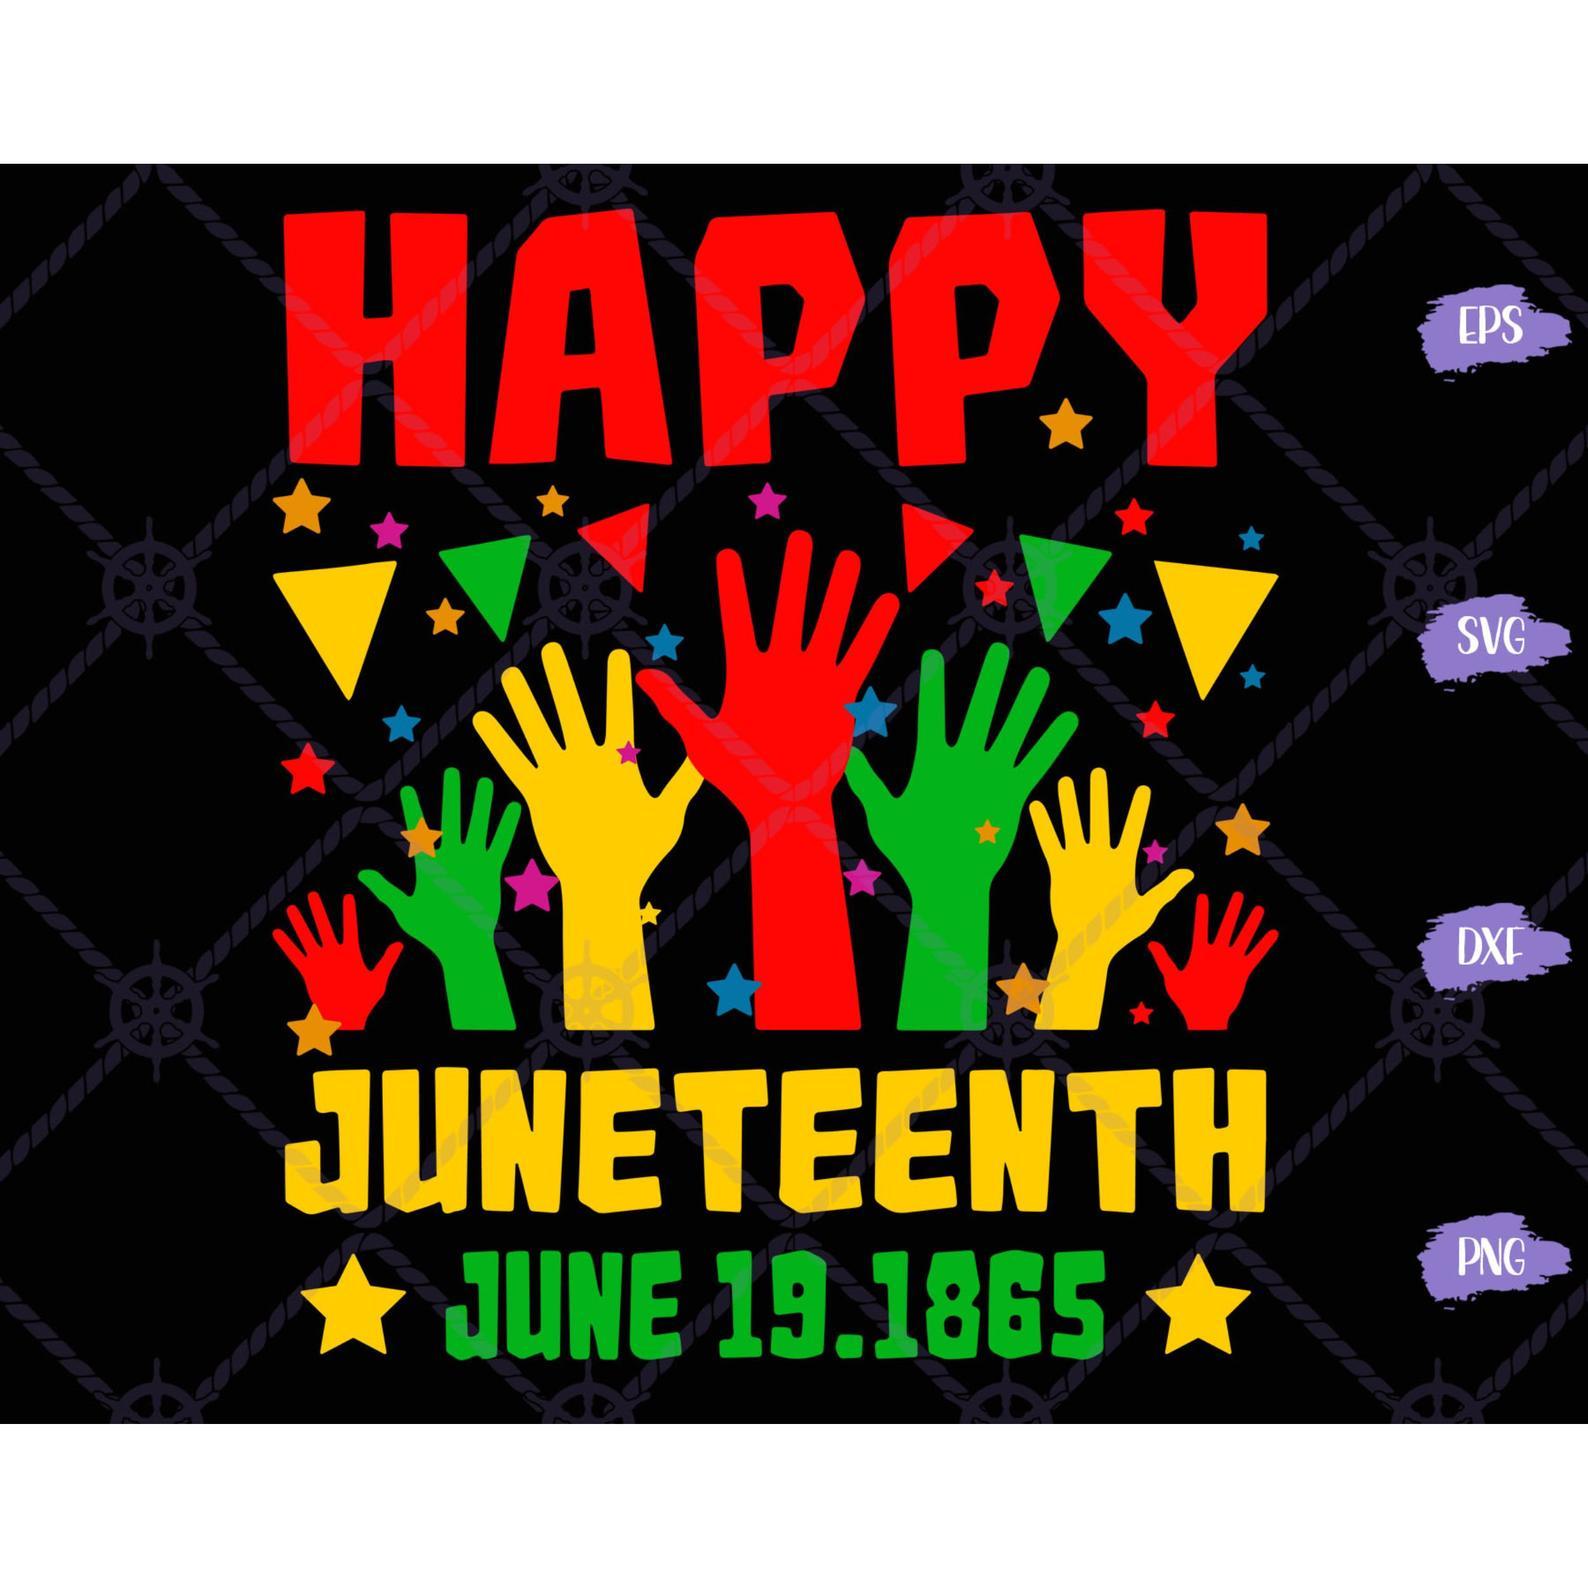 Happy Juneteenth!